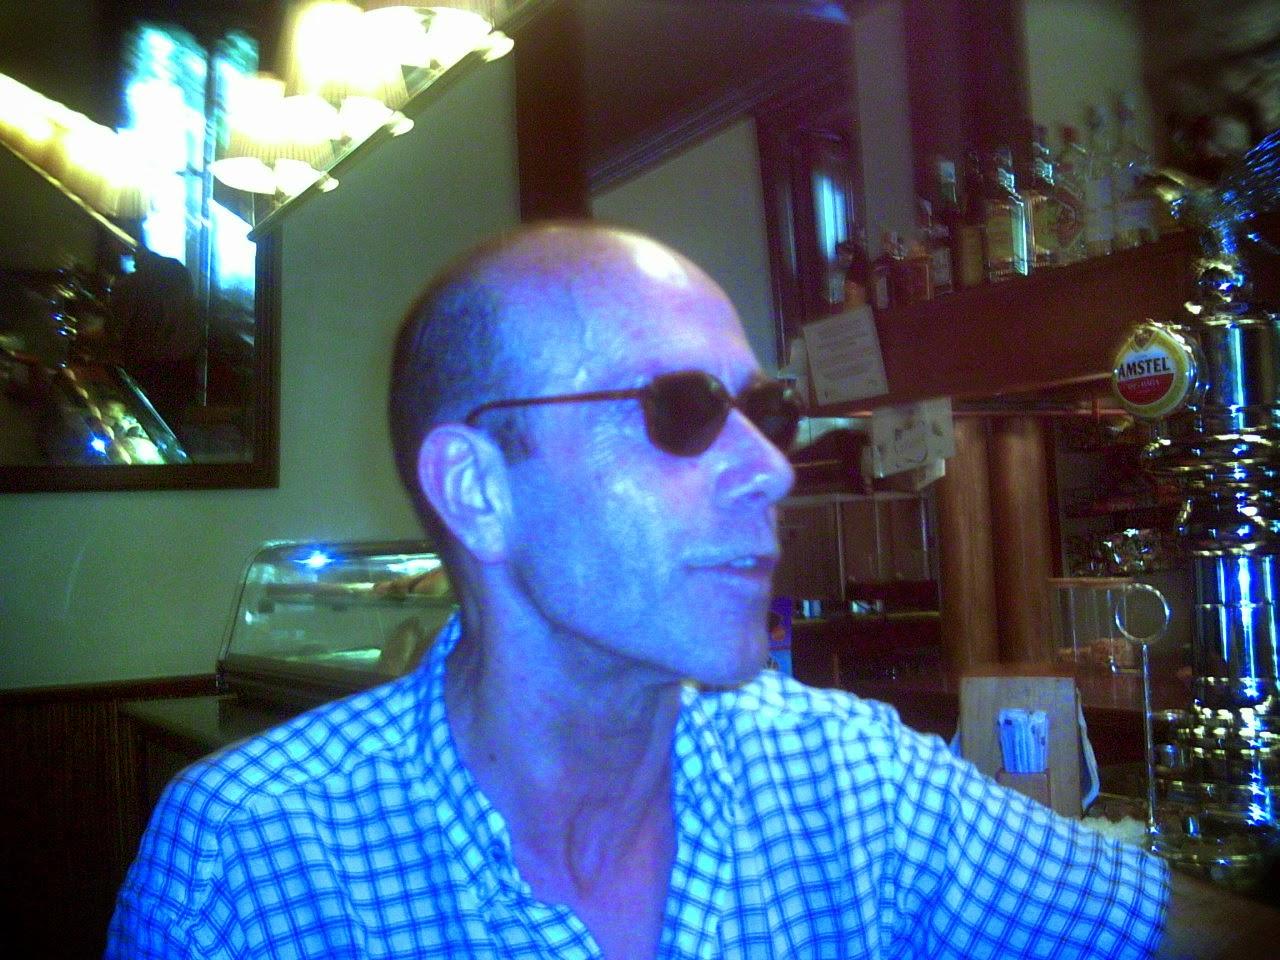 Jorge Marino Valcarcel Olcina